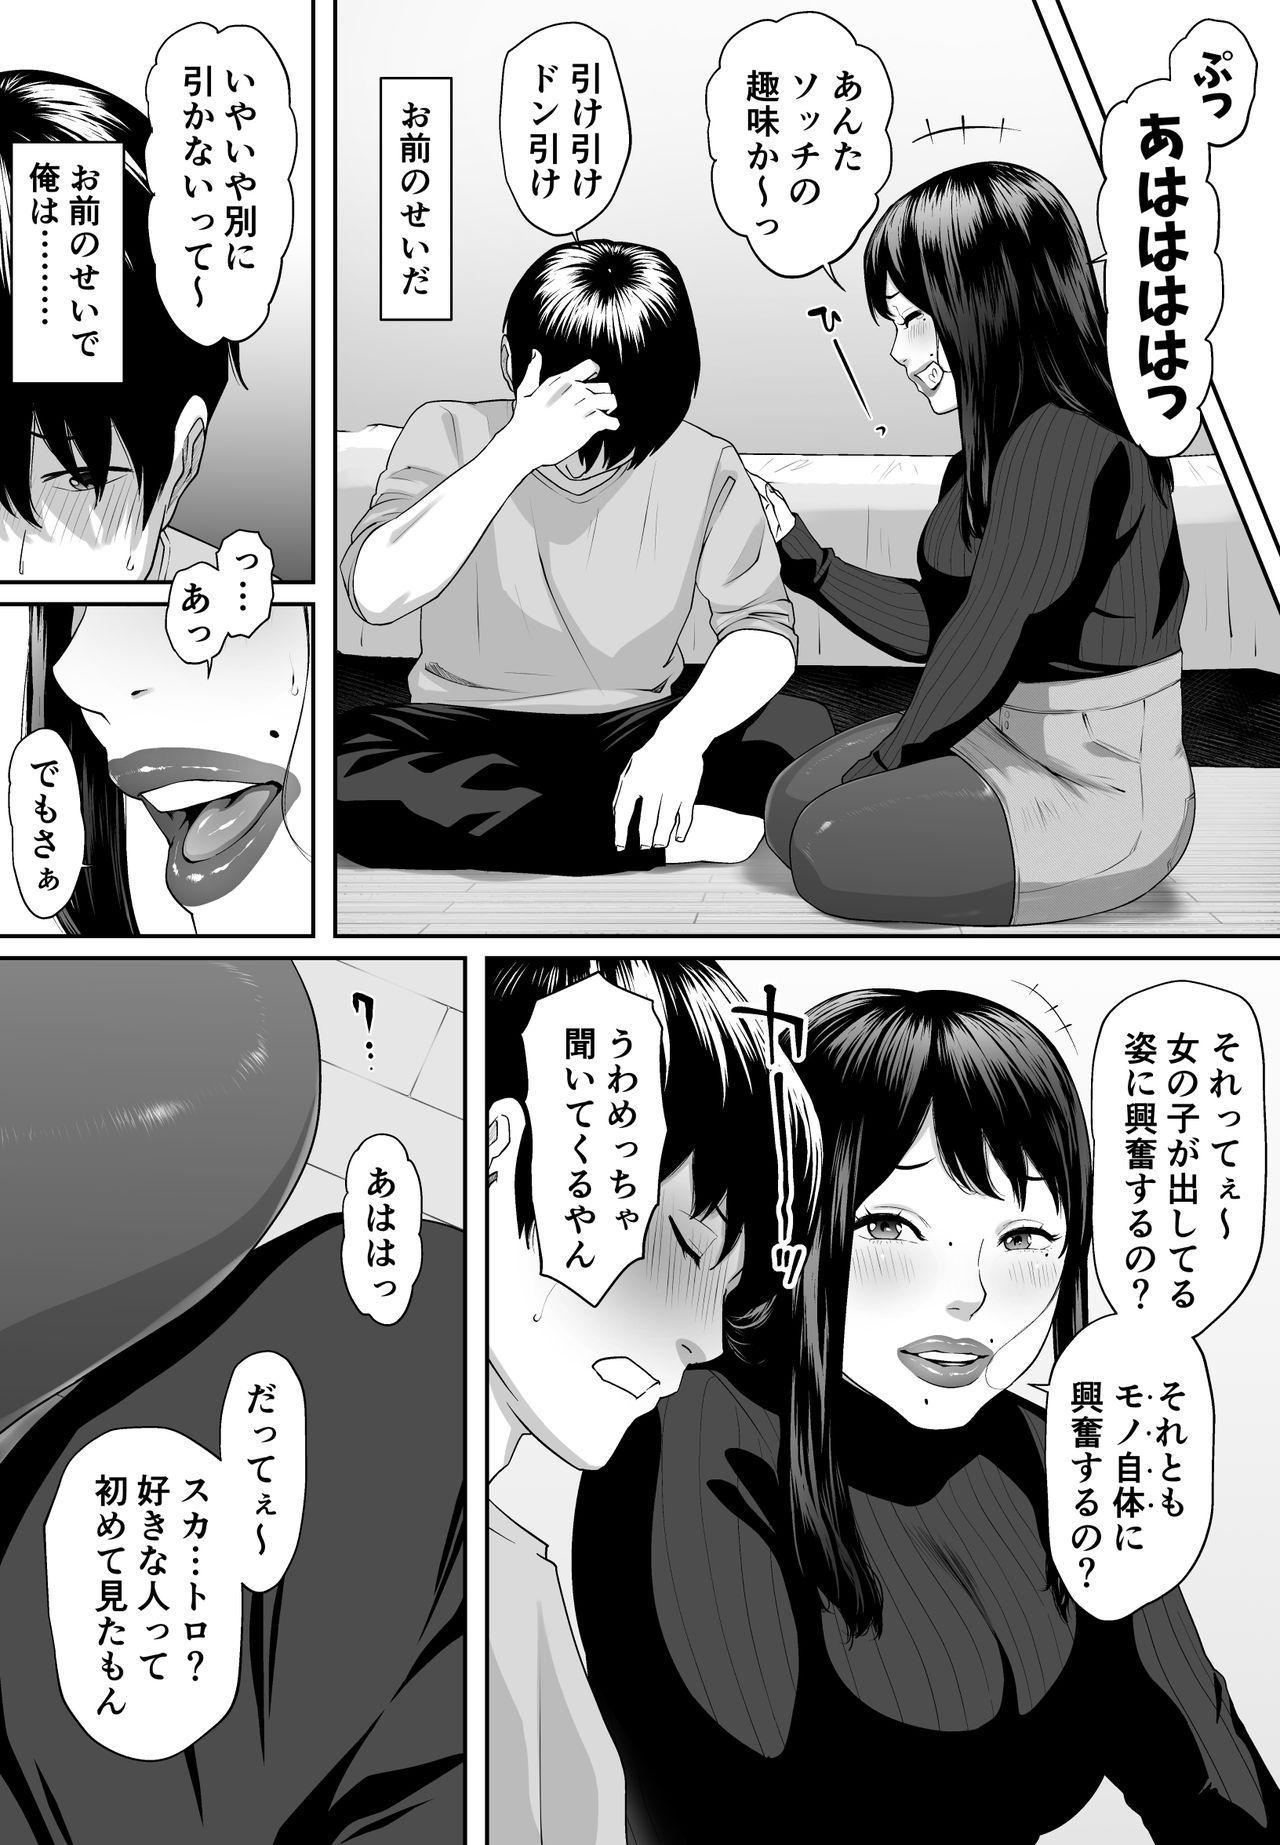 Mild Hentai NANA 14